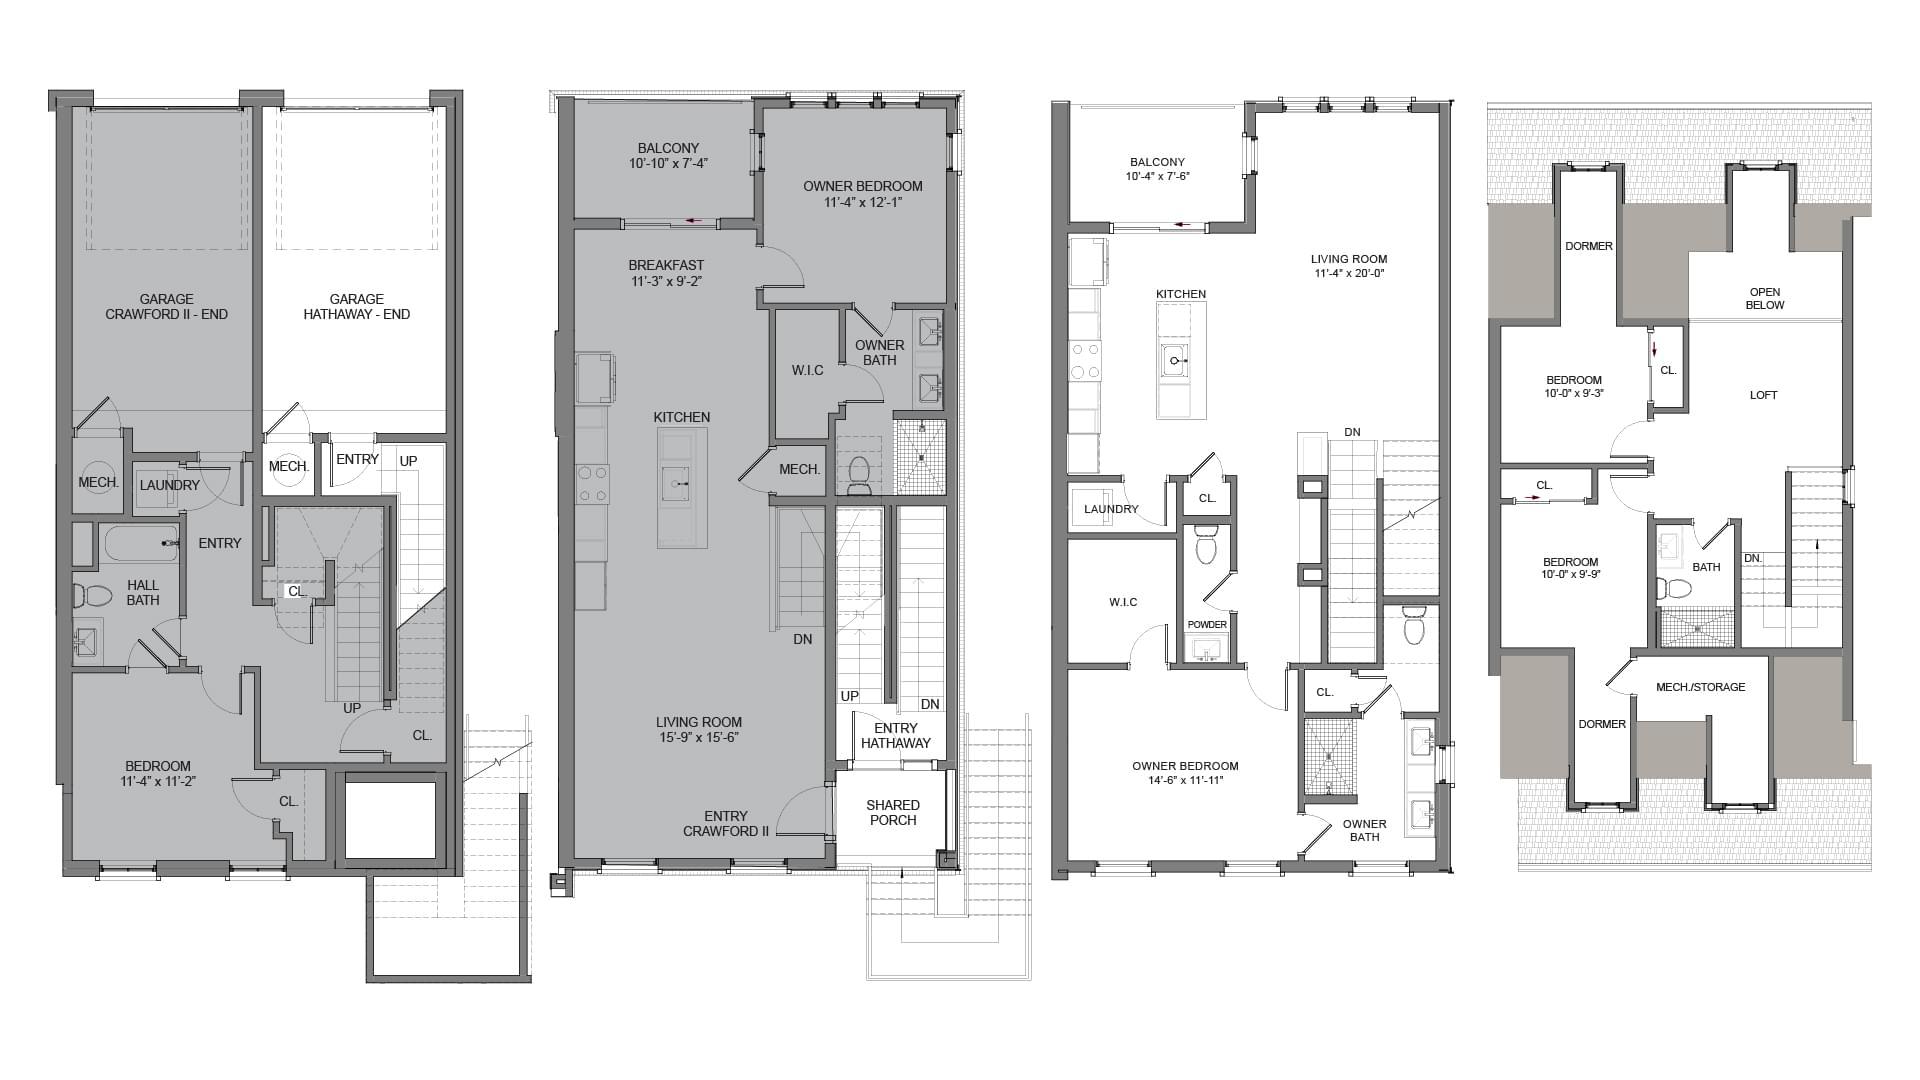 Floor Plans - End Unit R. The Hathaway New Home in Alpharetta, GA